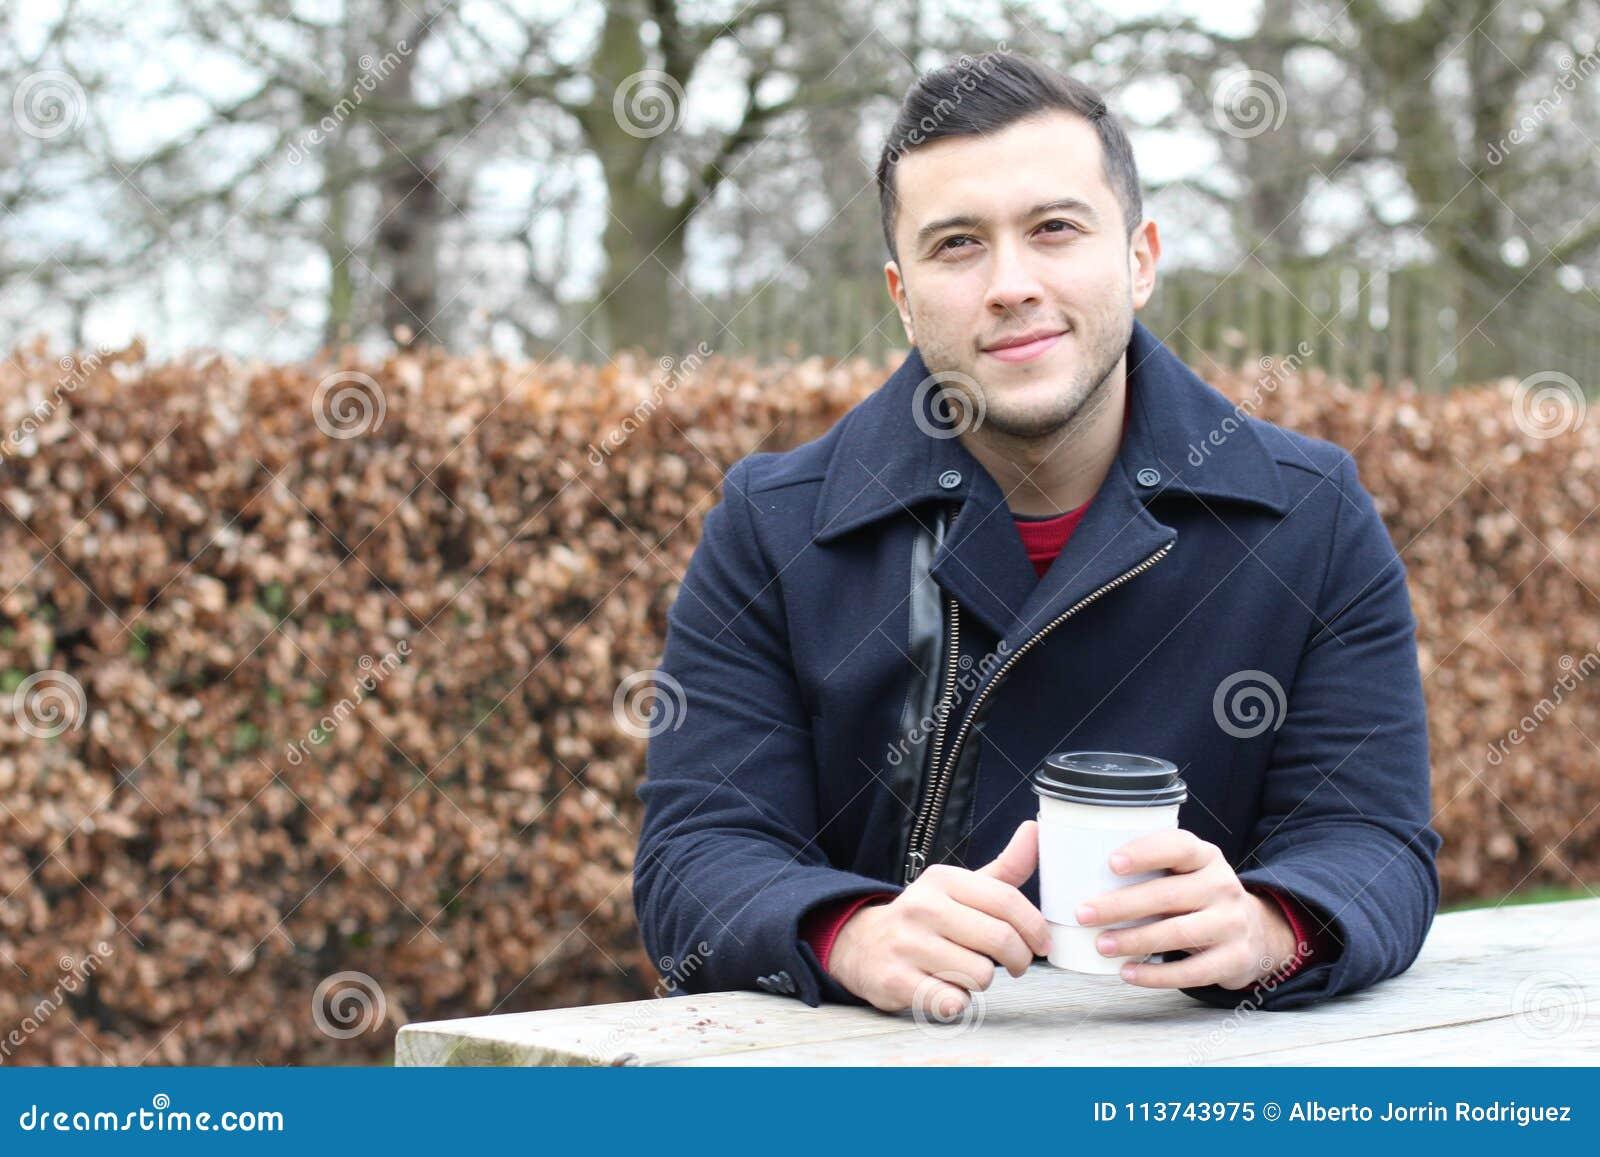 Take Break Coffeebreak : Ethnic businessman taking a coffee break stock image image of